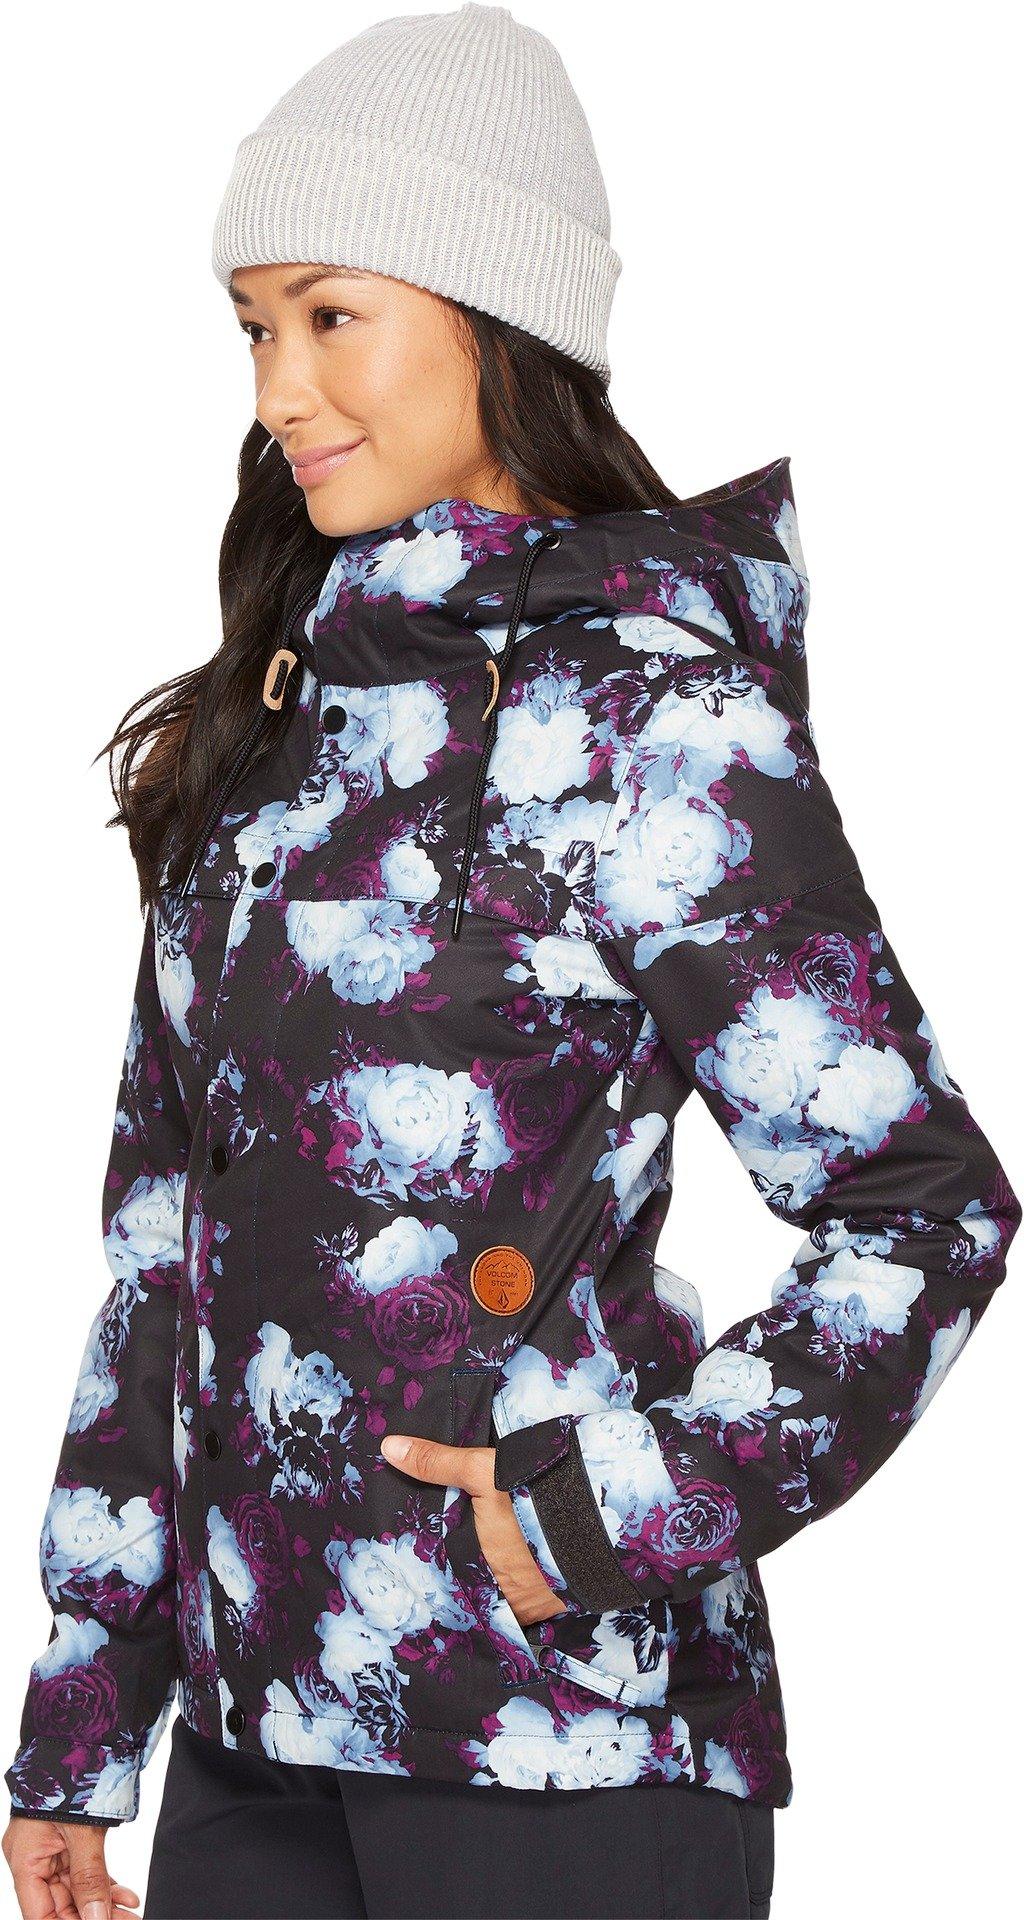 Volcom Snow Women's Bolt Insulated Jacket Multi XX-Small by Volcom (Image #2)